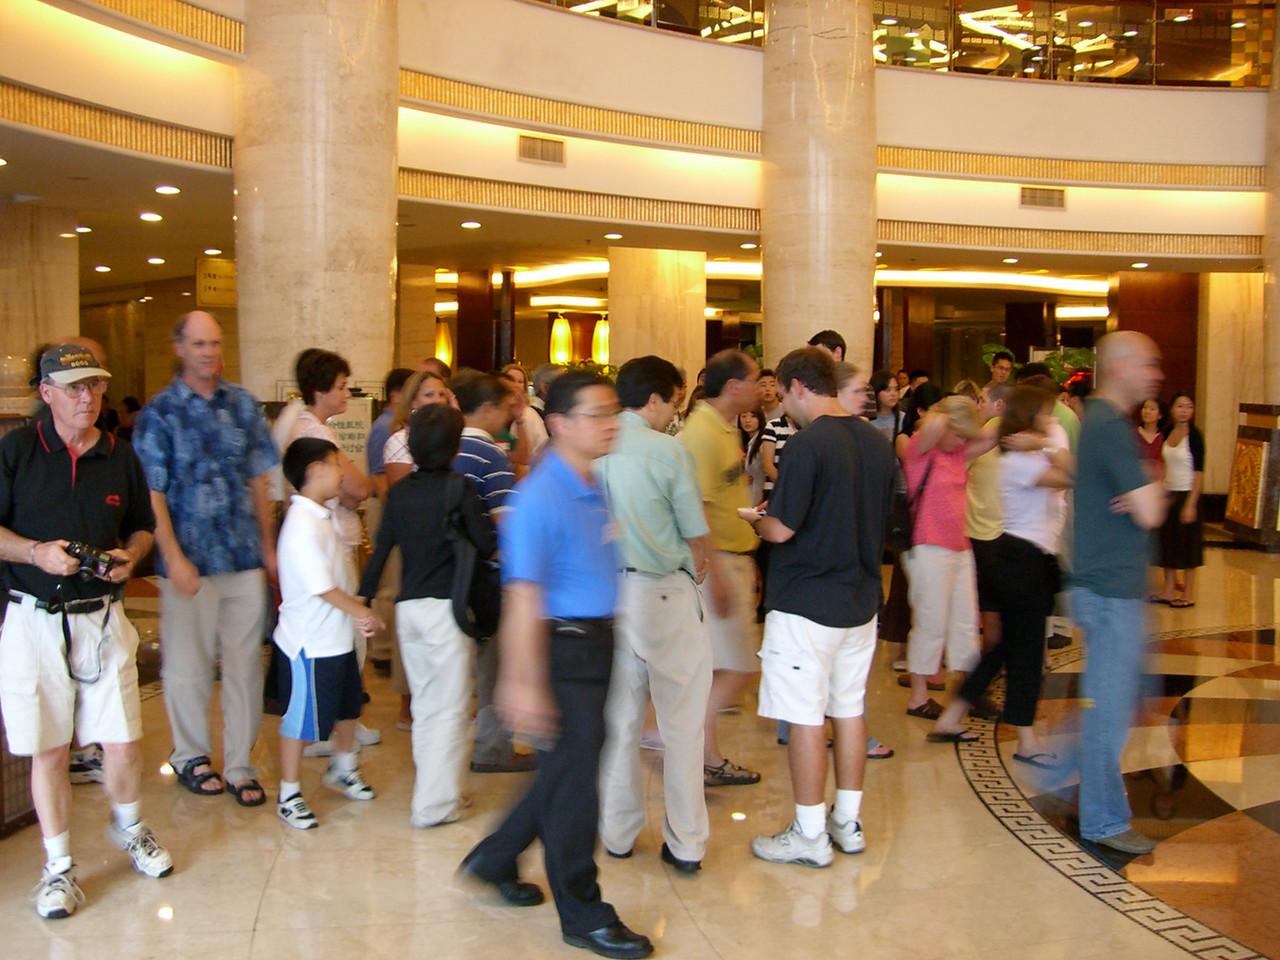 2006 07 15 Sat - Photo opp in Yong Jiang Hotel lobby